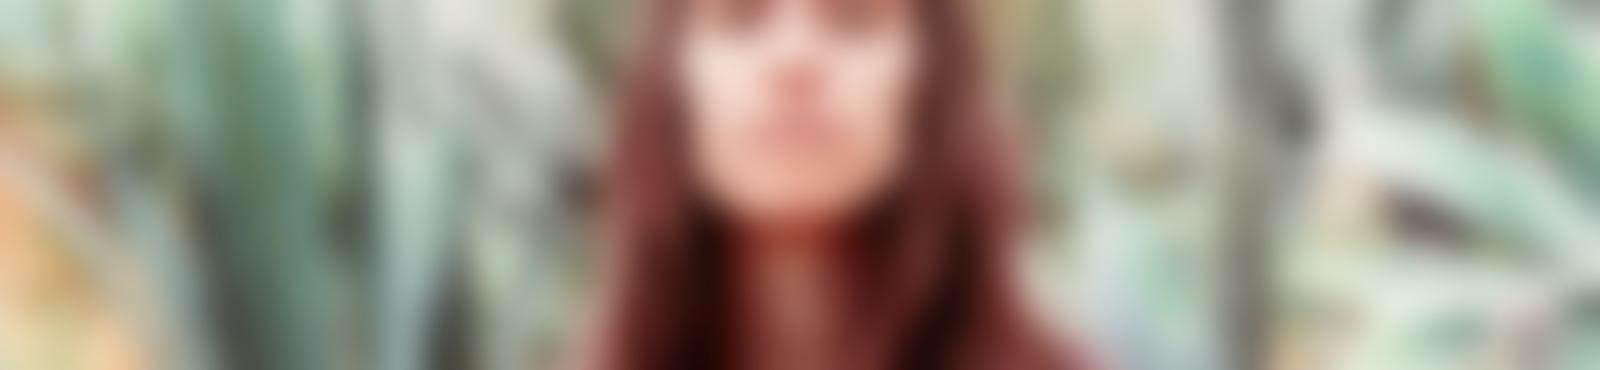 Blurred 3d5ab172 d36a 48d6 914c ff35580fc560